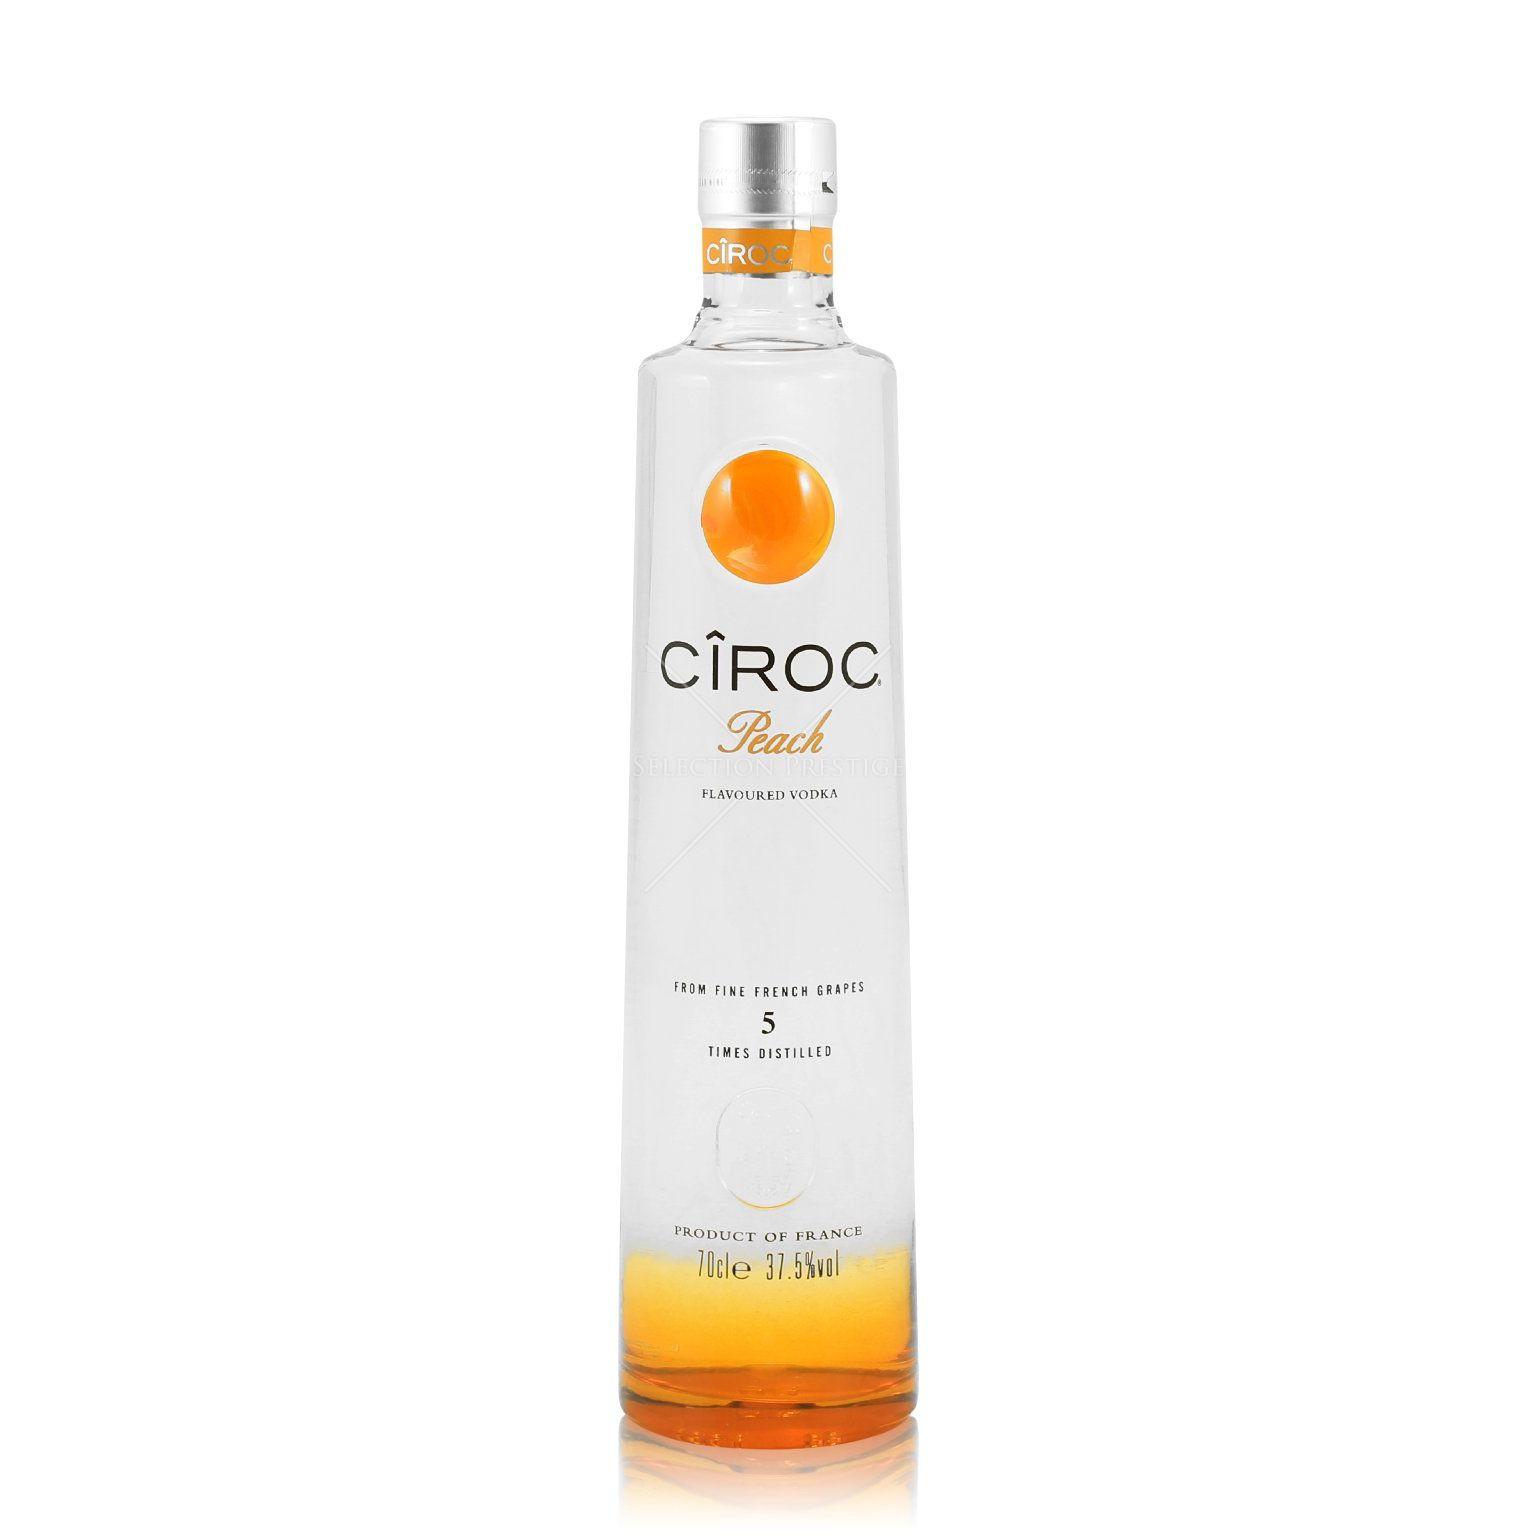 Peach Ciroc Drink Recipes  Cîroc Peach 0 7L 37 Vol Ciroc Vodka